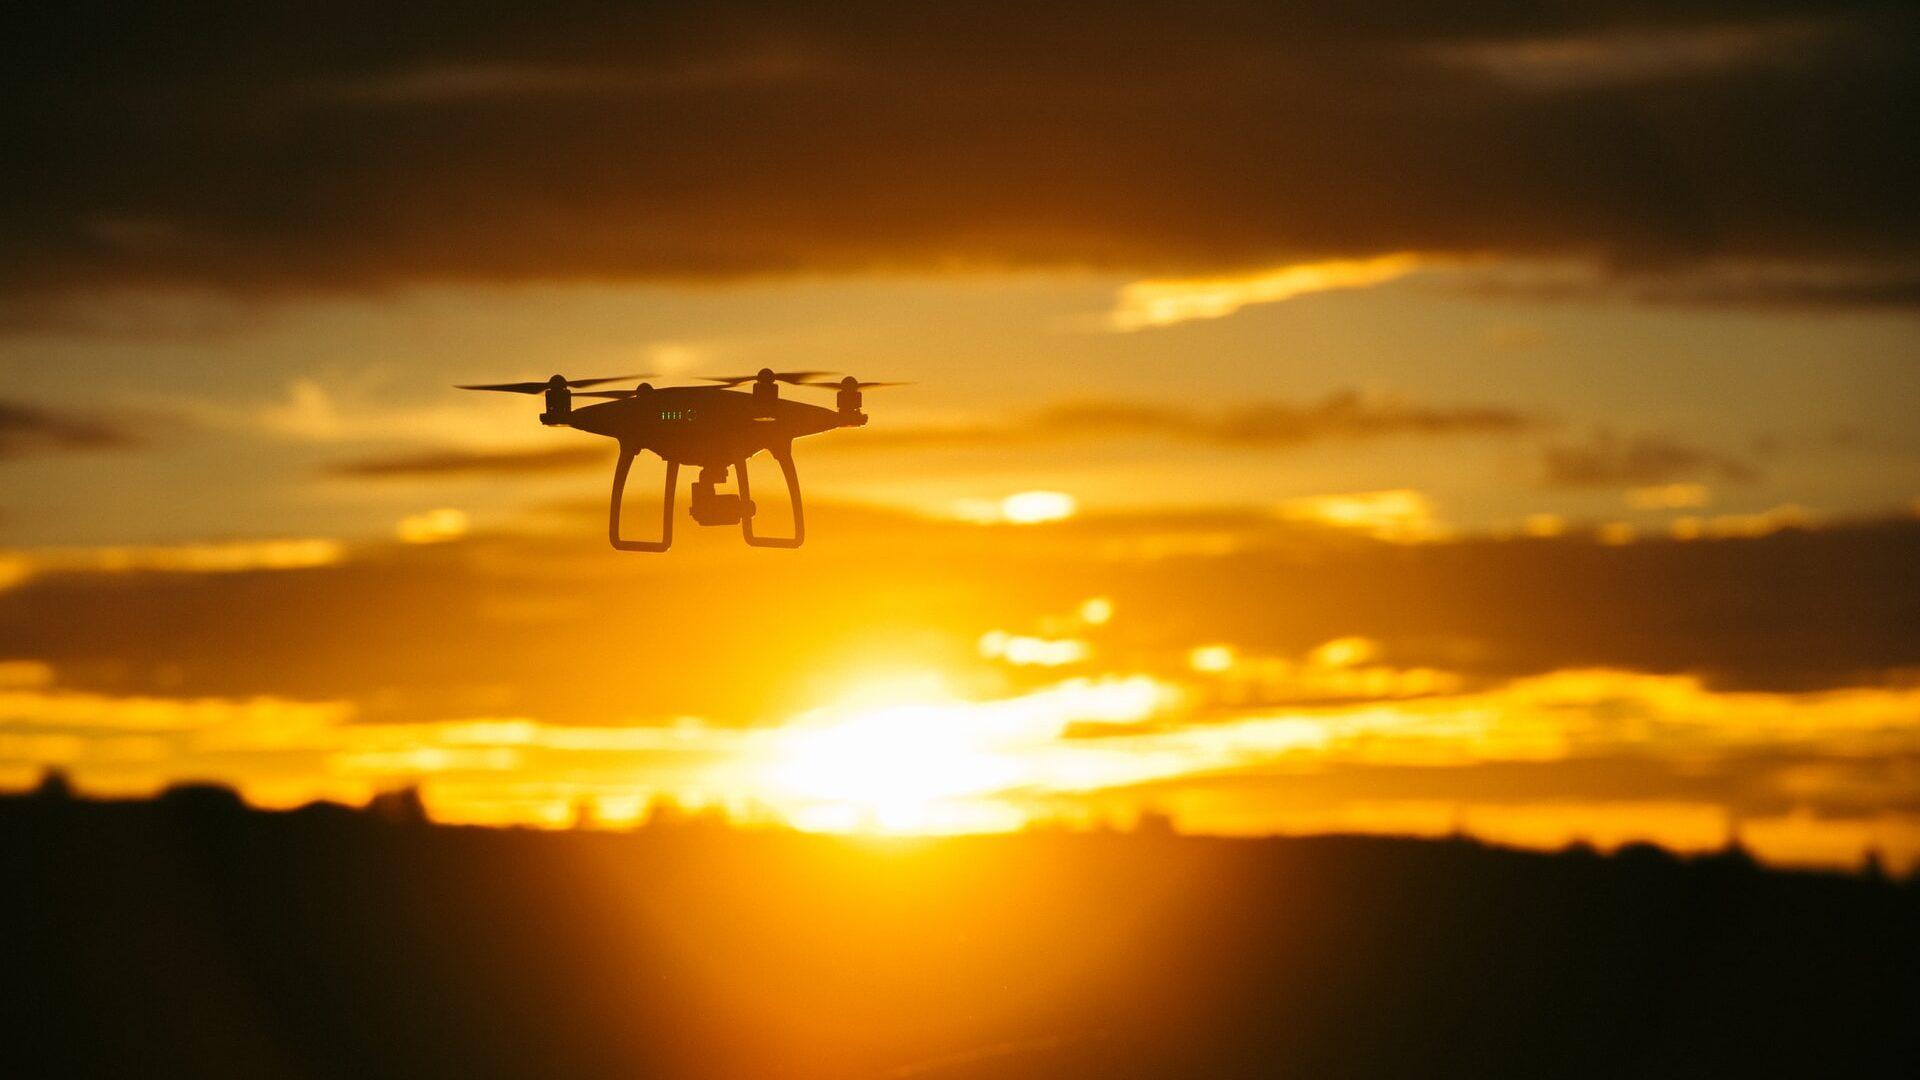 Pilot-Less Program: Drone Firms Plan Test Of Anti-Collision System